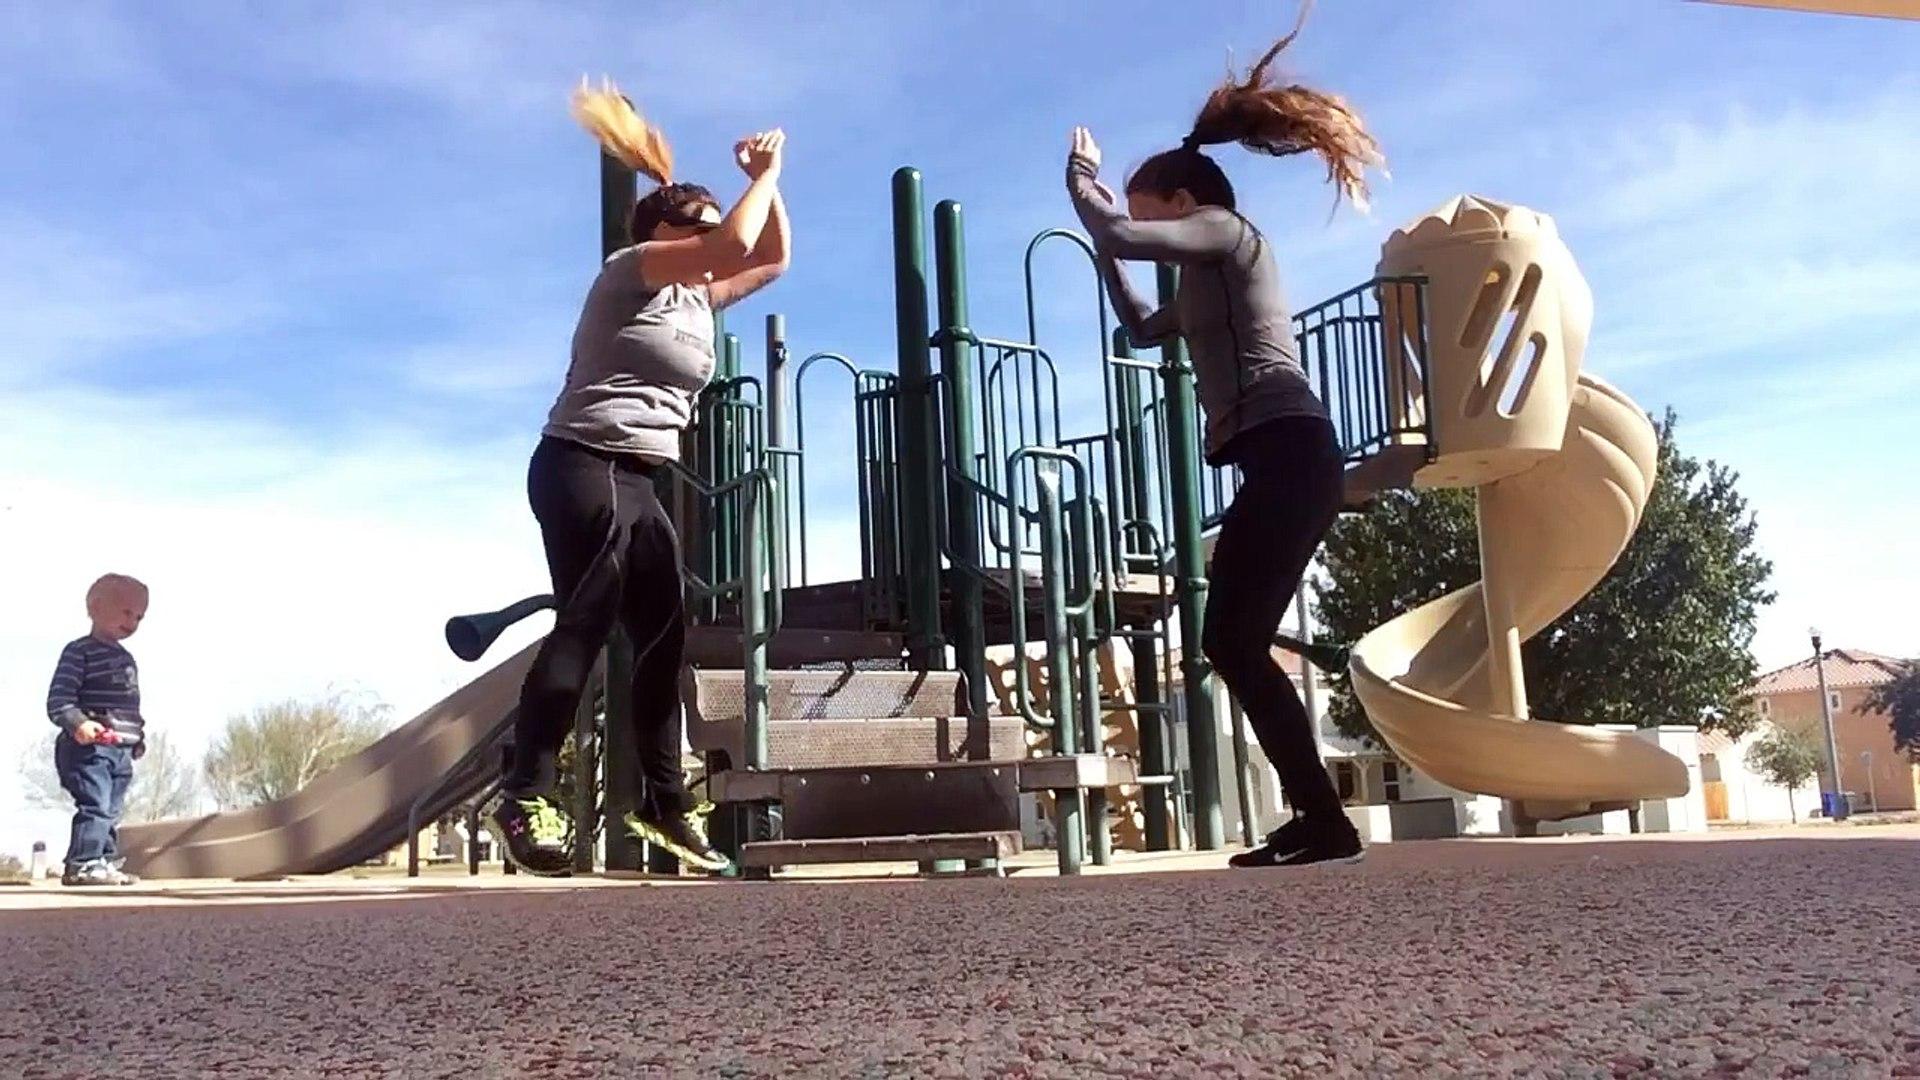 Partner Bodyweight Toning, Cardio and Strength Workout